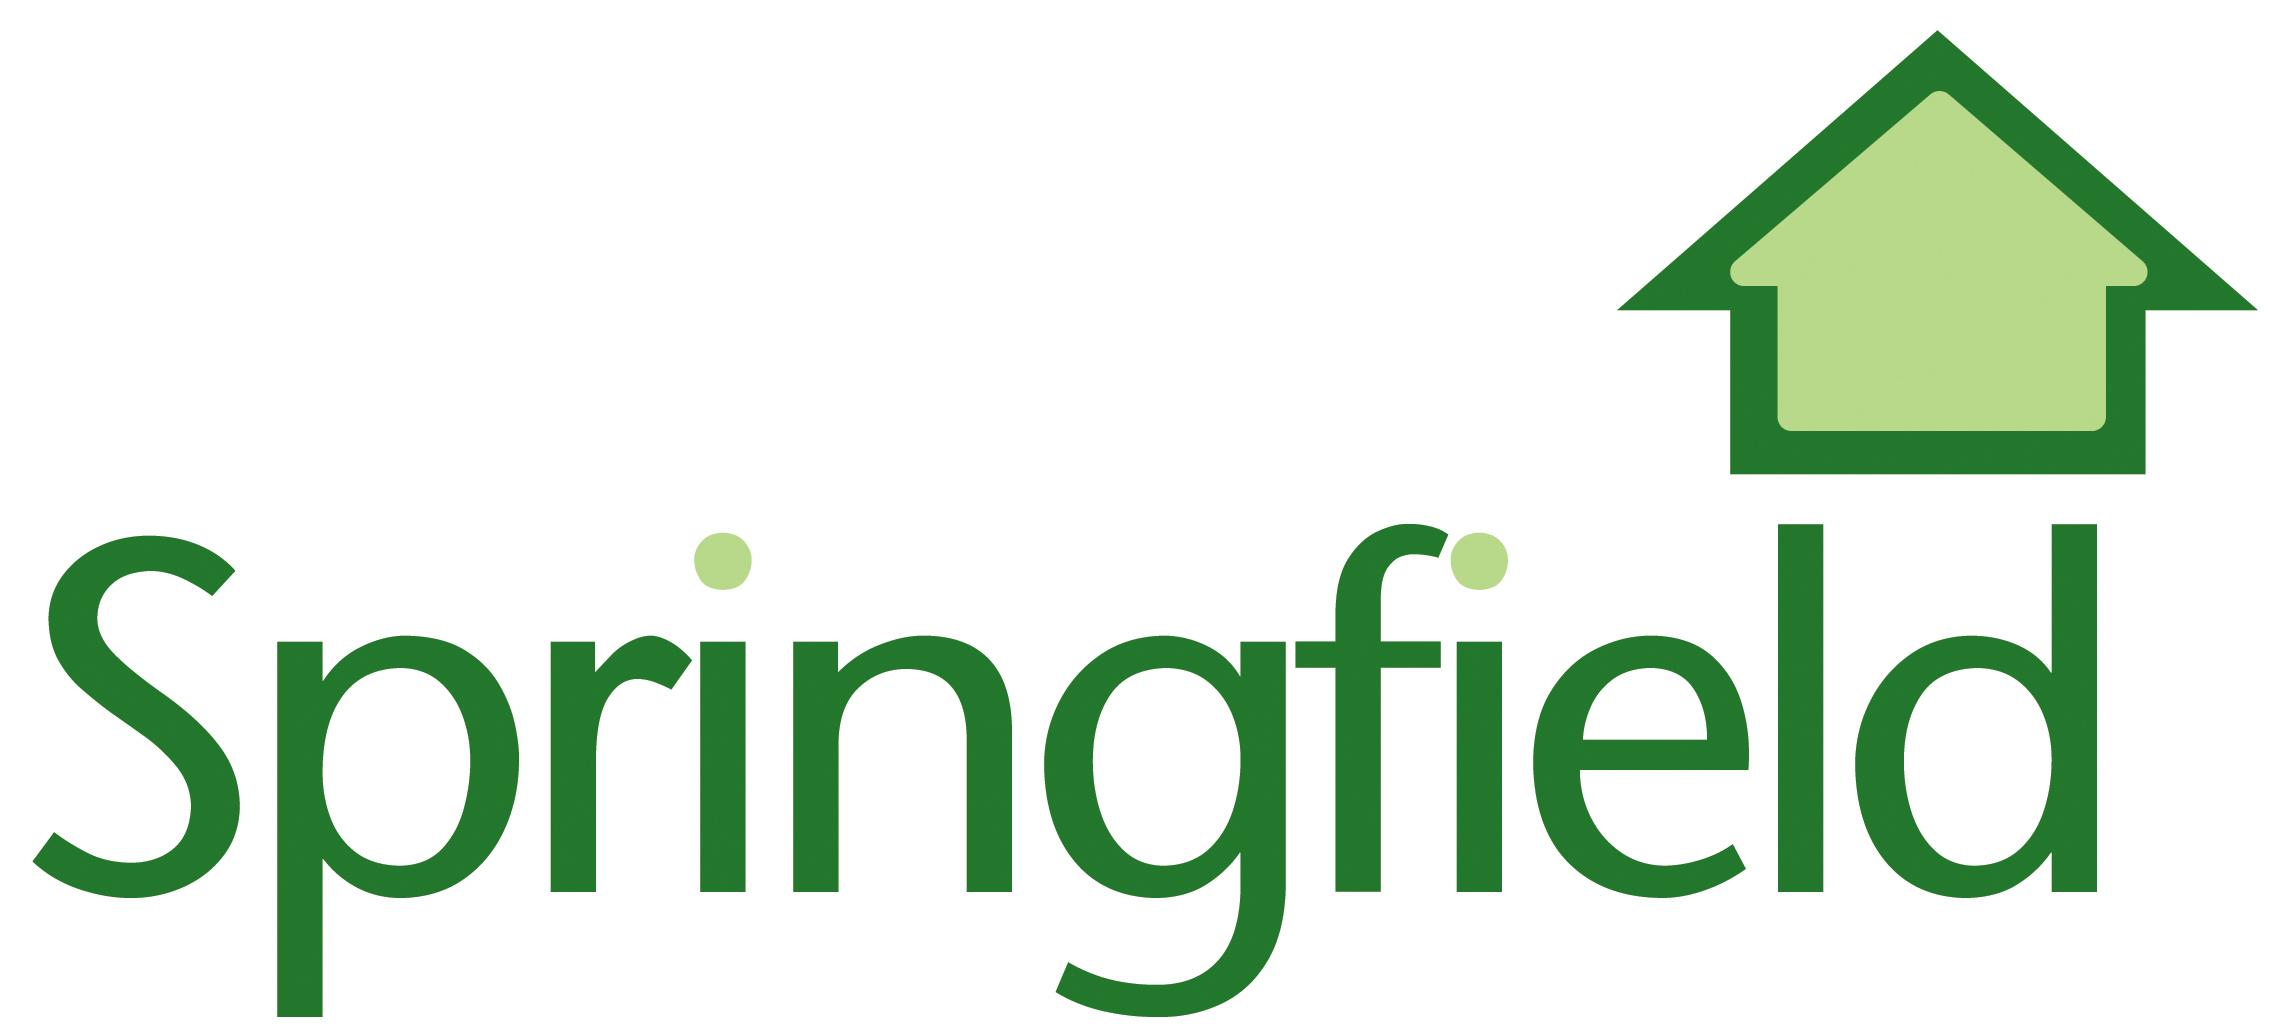 Springfield Properties Plc